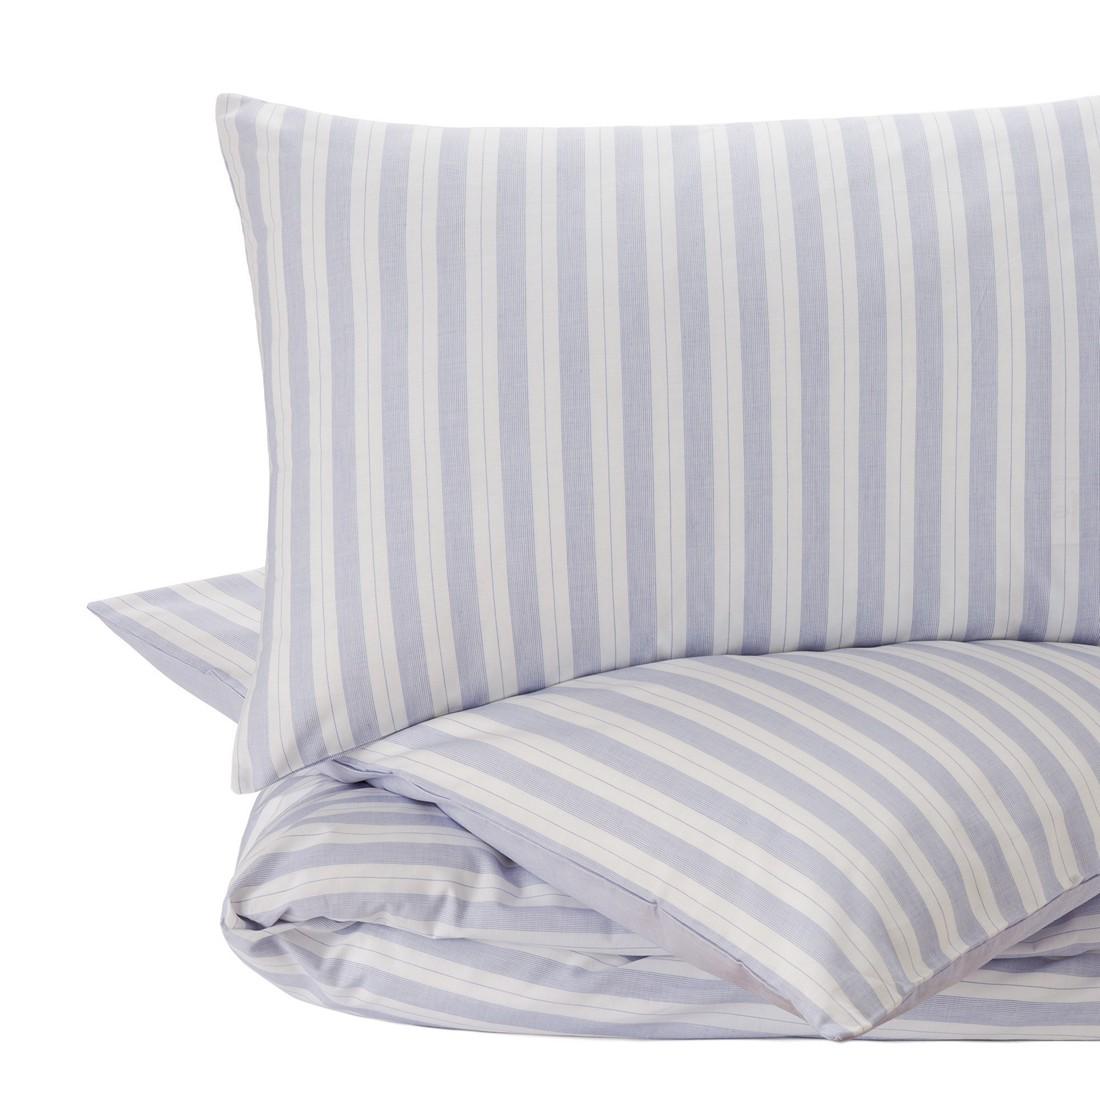 baumwoll bettw sche izeda bettbezug bettbez ge bett bezug. Black Bedroom Furniture Sets. Home Design Ideas